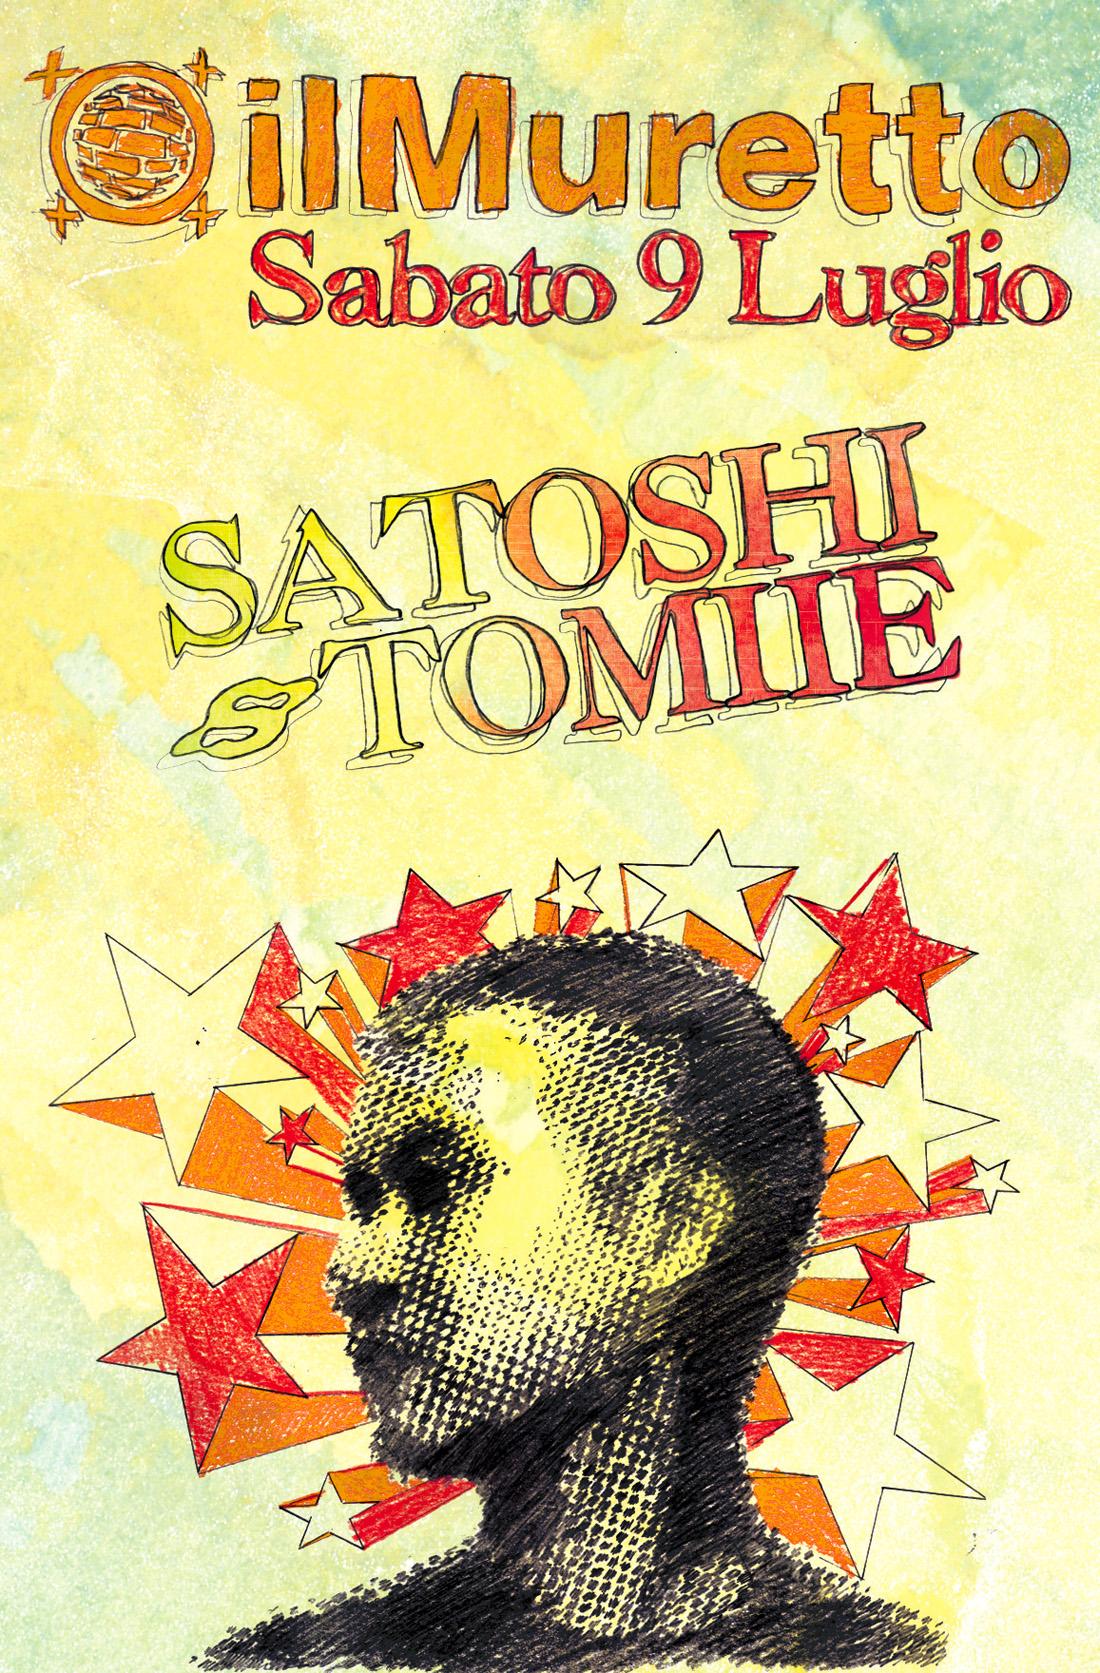 Satoshi Tomiie portrait for dj set night Il Muretto